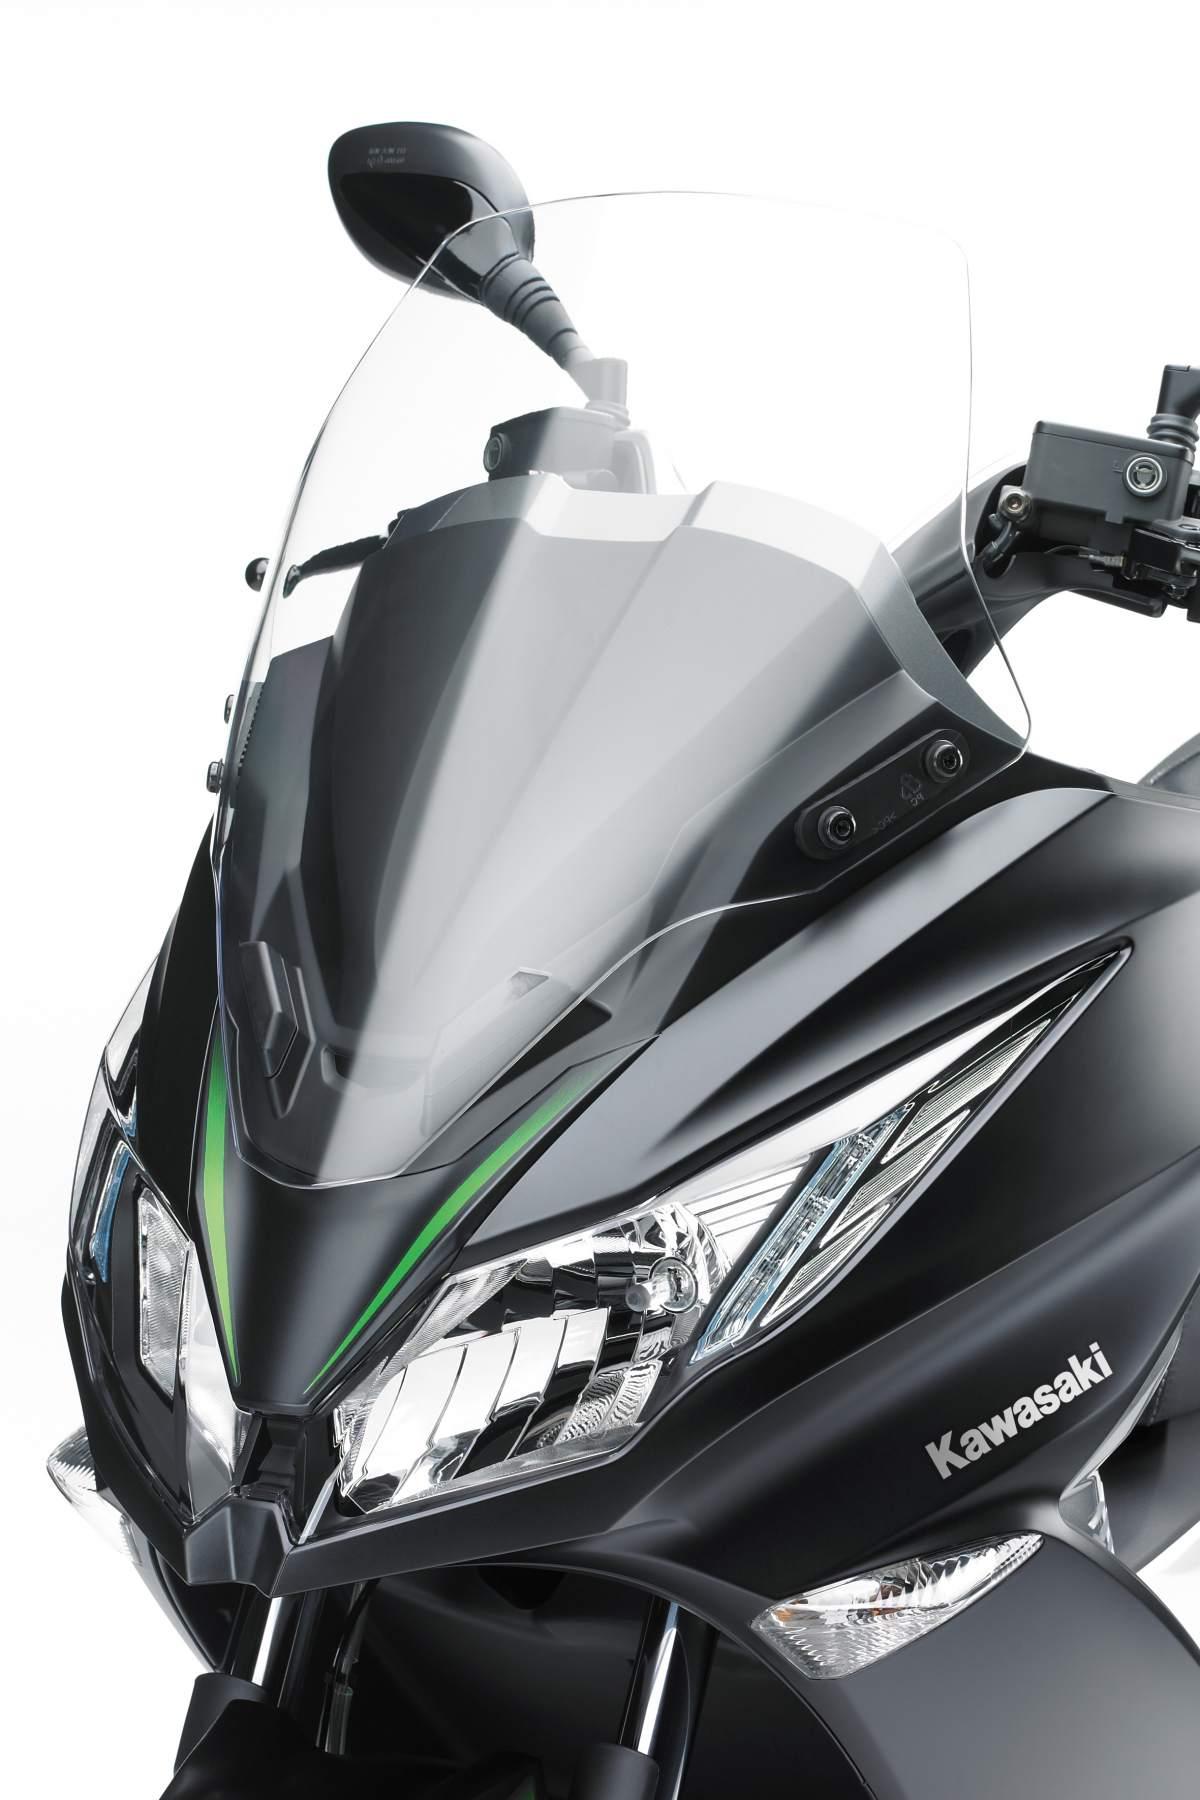 Kawasaki Announces Its First 125cc Scooter The J125 Visordown